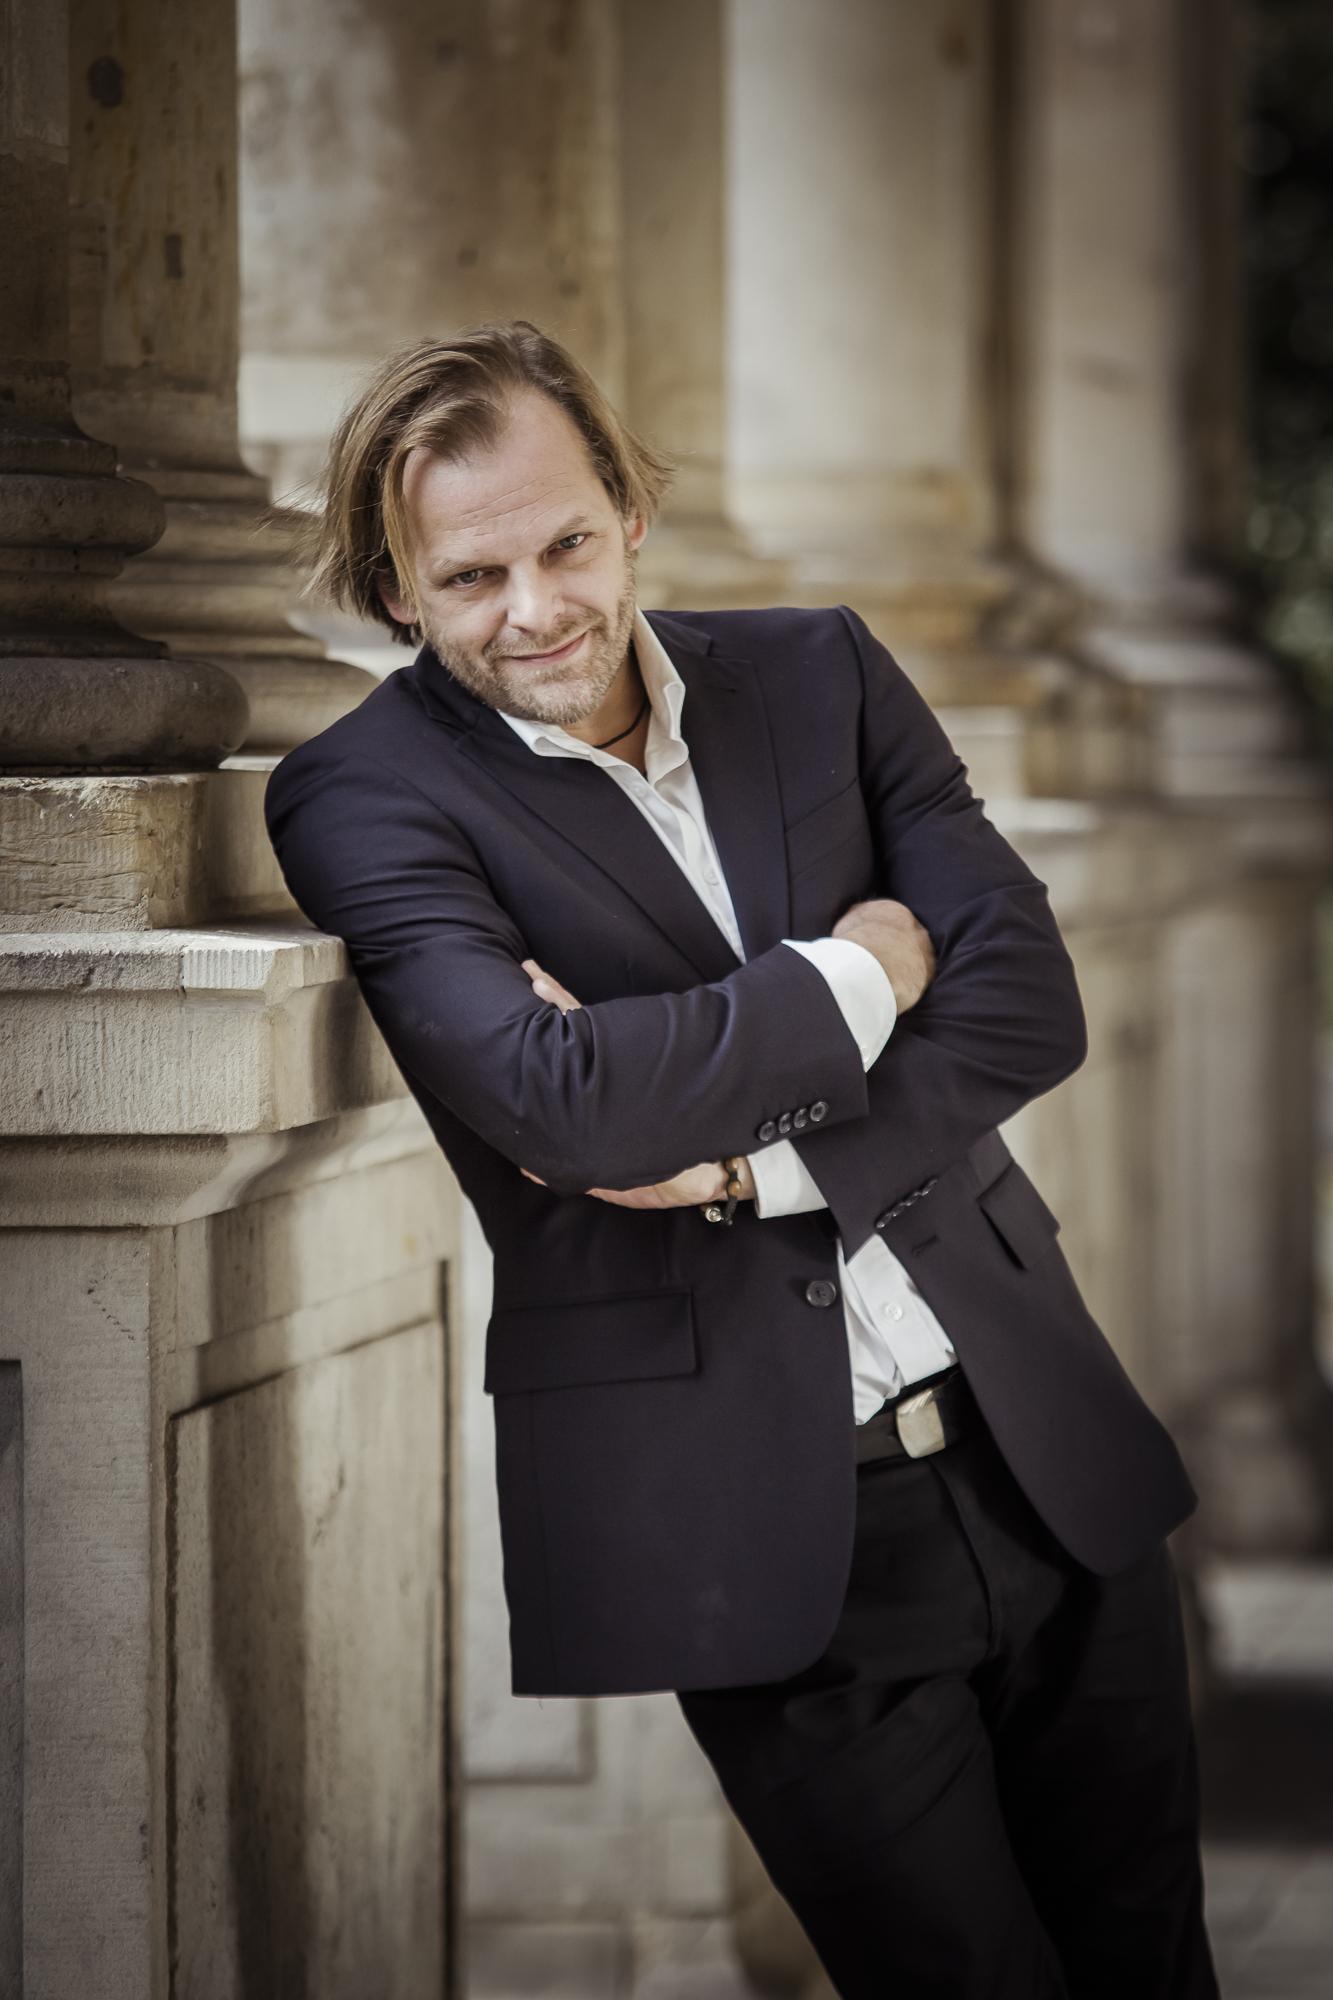 Portraitshooting | Gero Bergmann